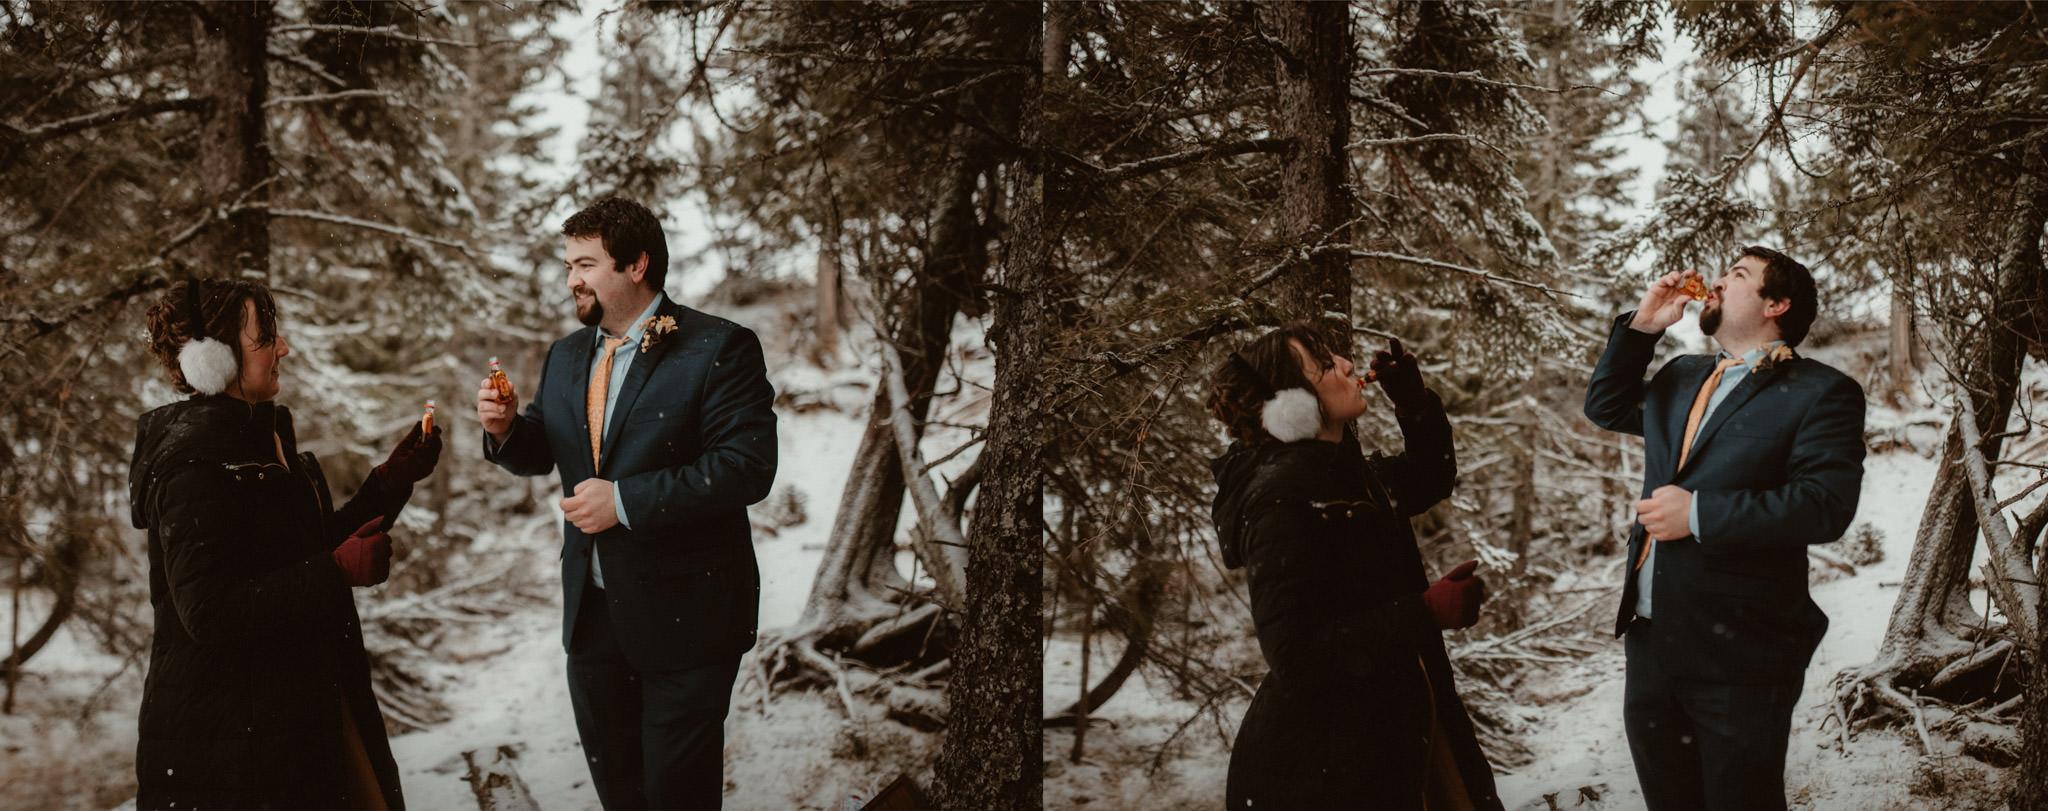 Drinking Fireball at winter elopement in Michigan